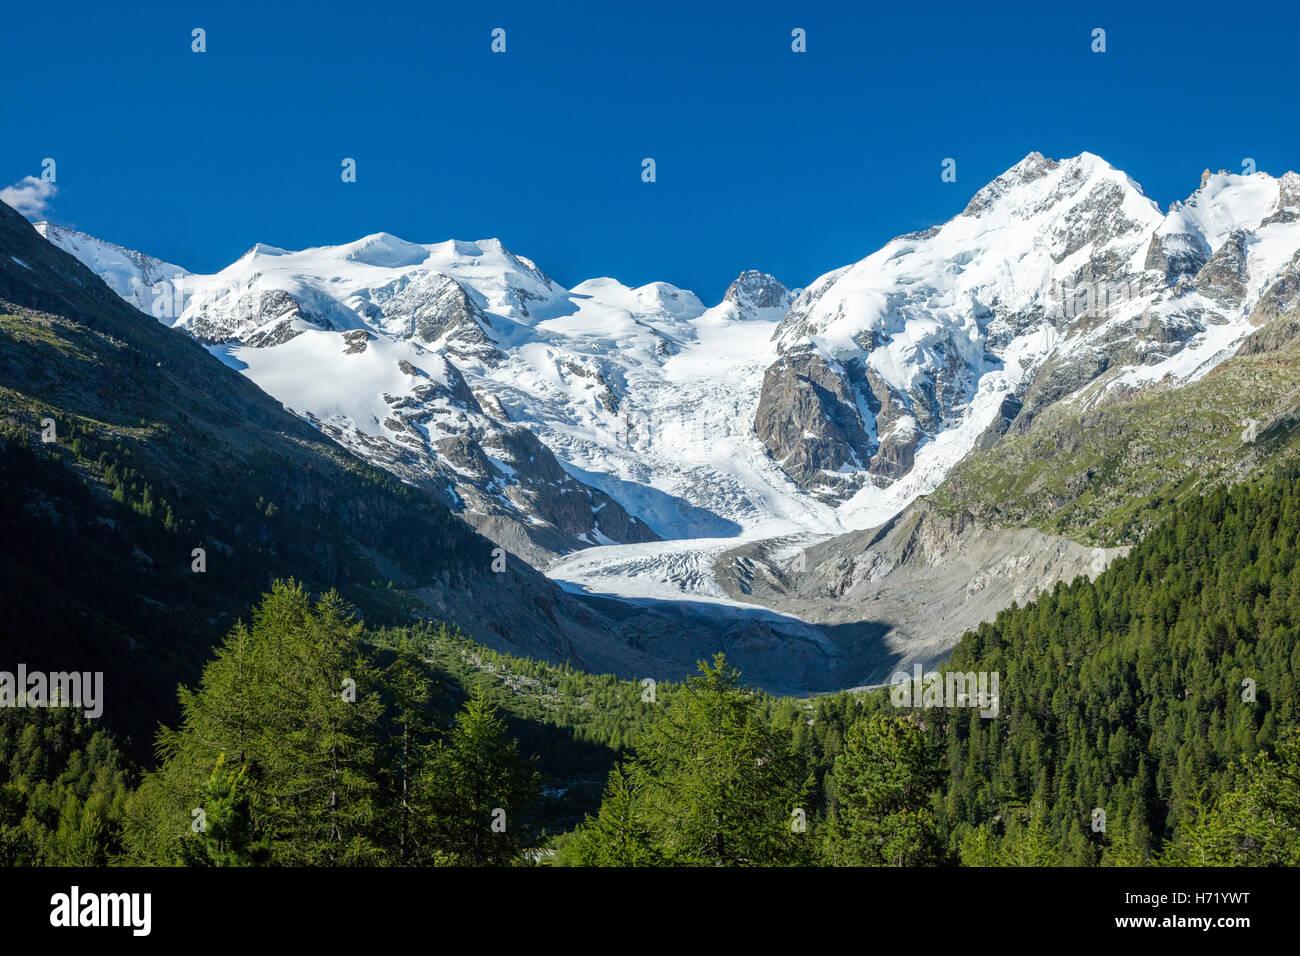 Piz Bernina and Morteratsch Glacier, Pontresina, near St Moritz, Berniner Alps, Graubunden, Switzerland. - Stock Image